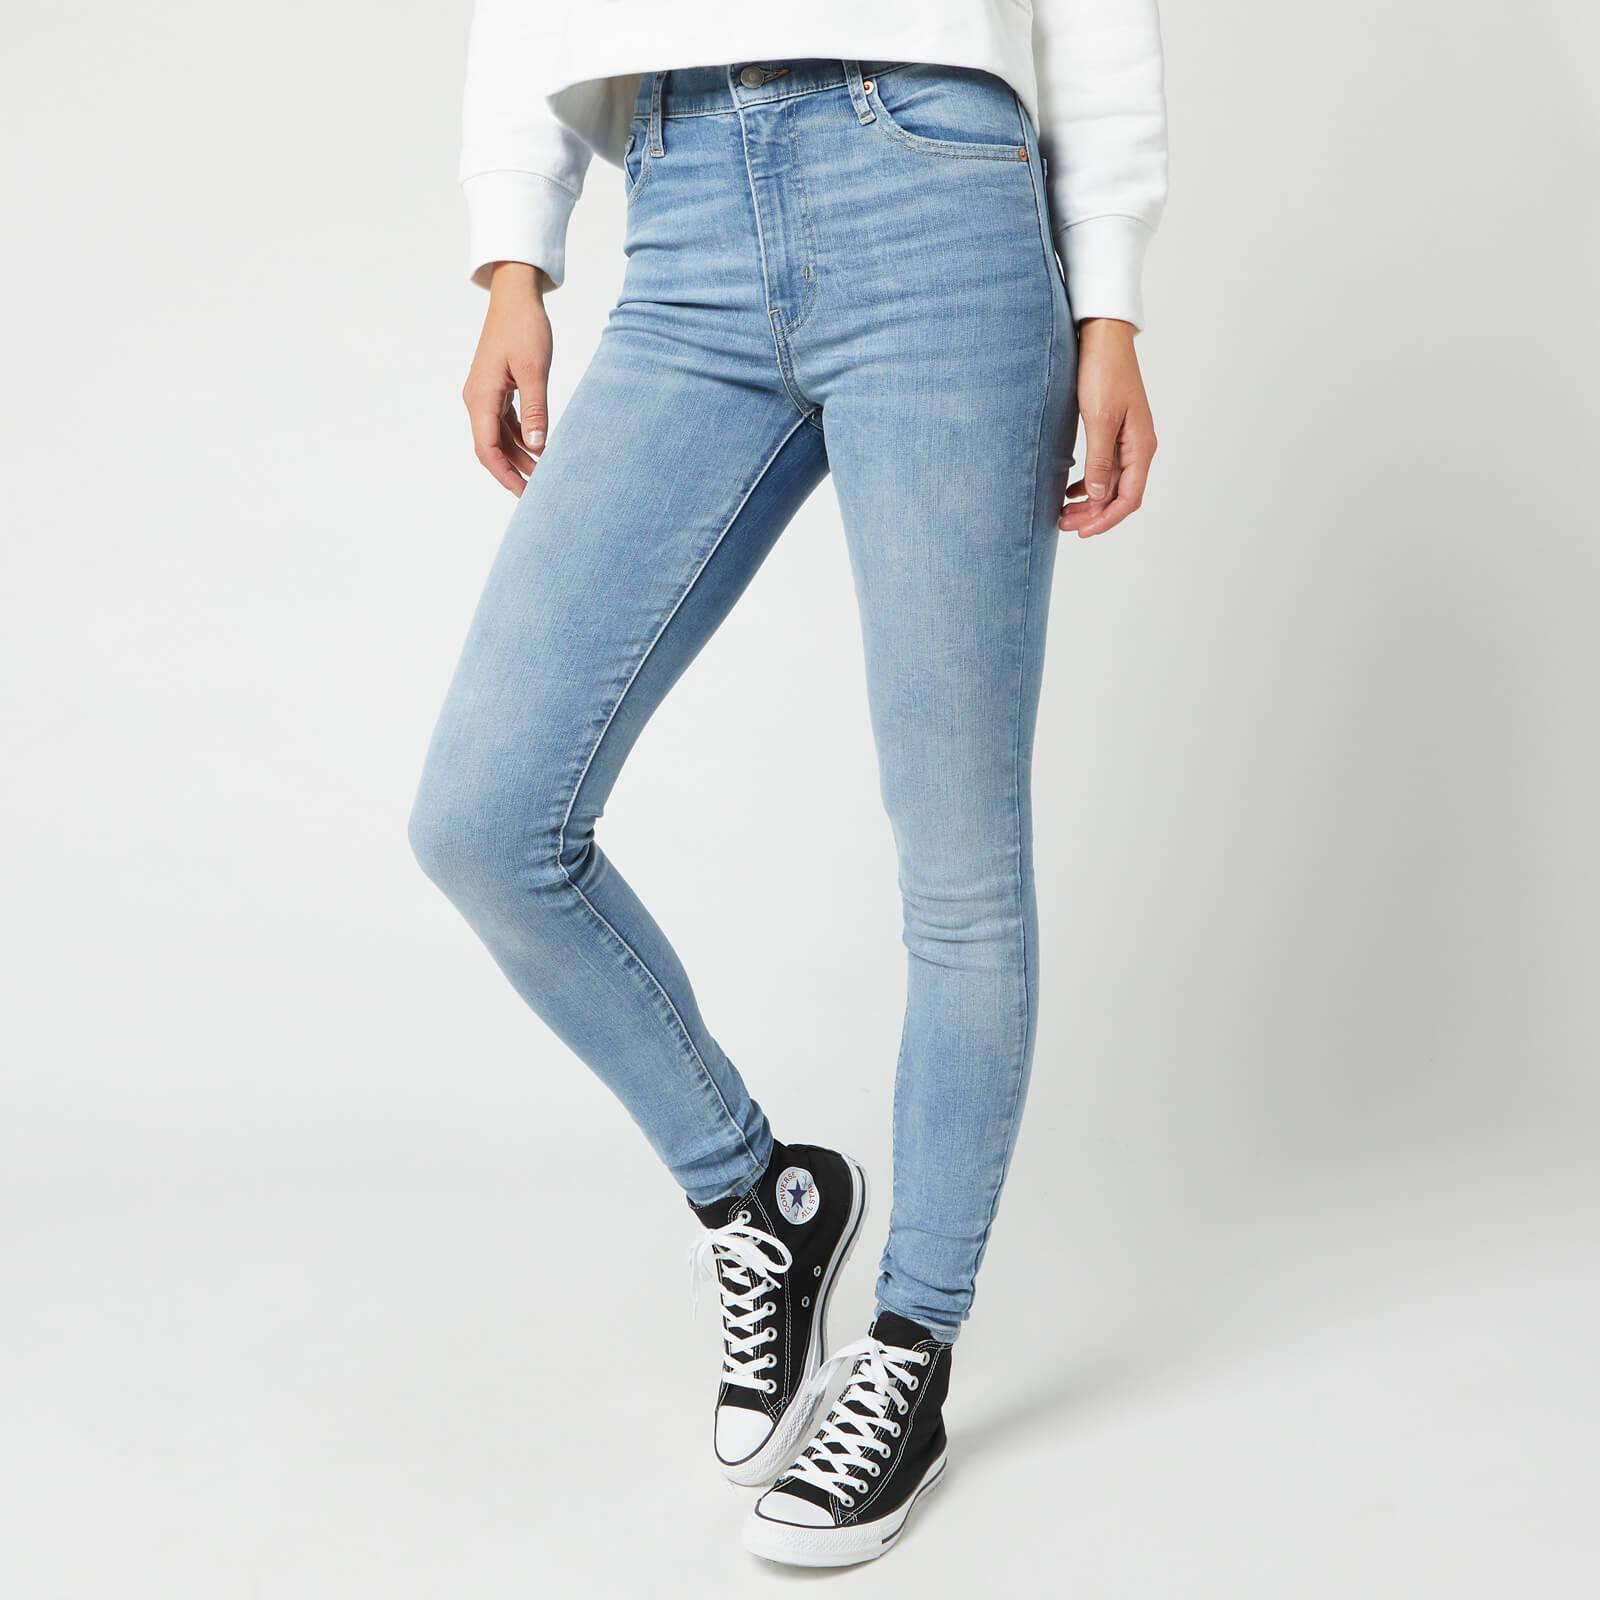 Levi's s Mile High Super Skinny Jeans - You Got Me - W28/L30